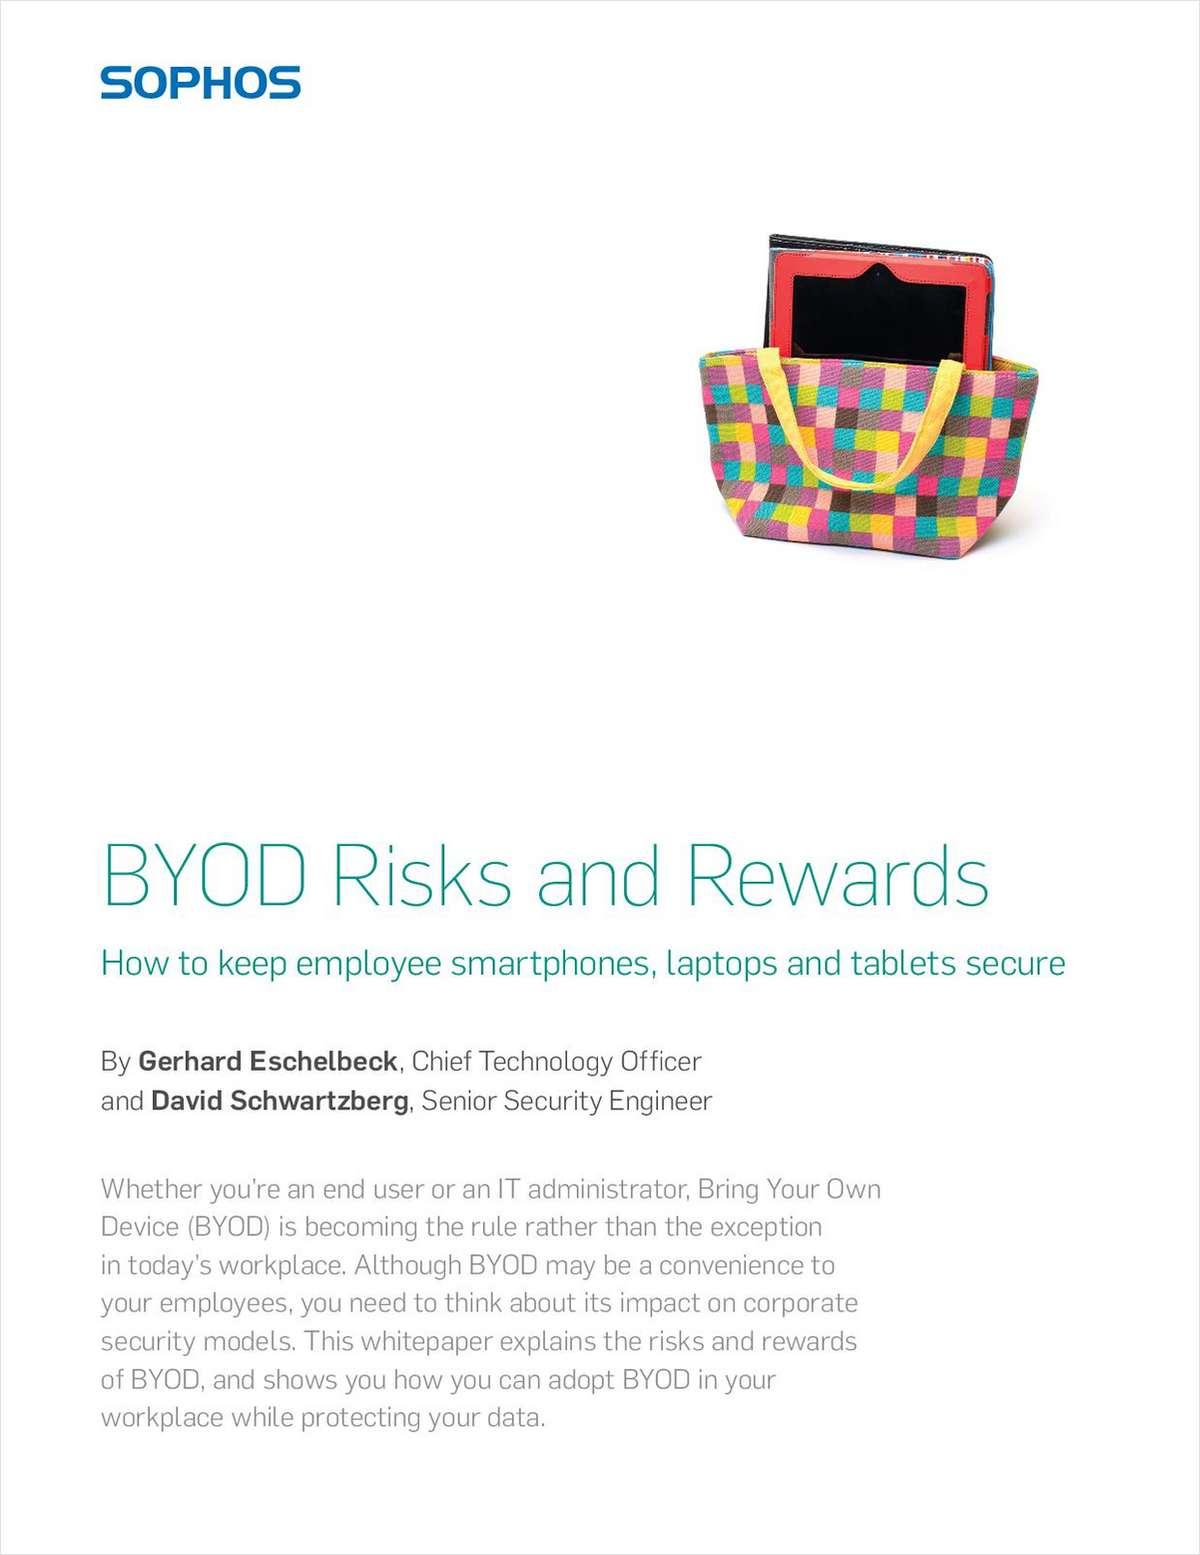 BYOD Risks and Rewards